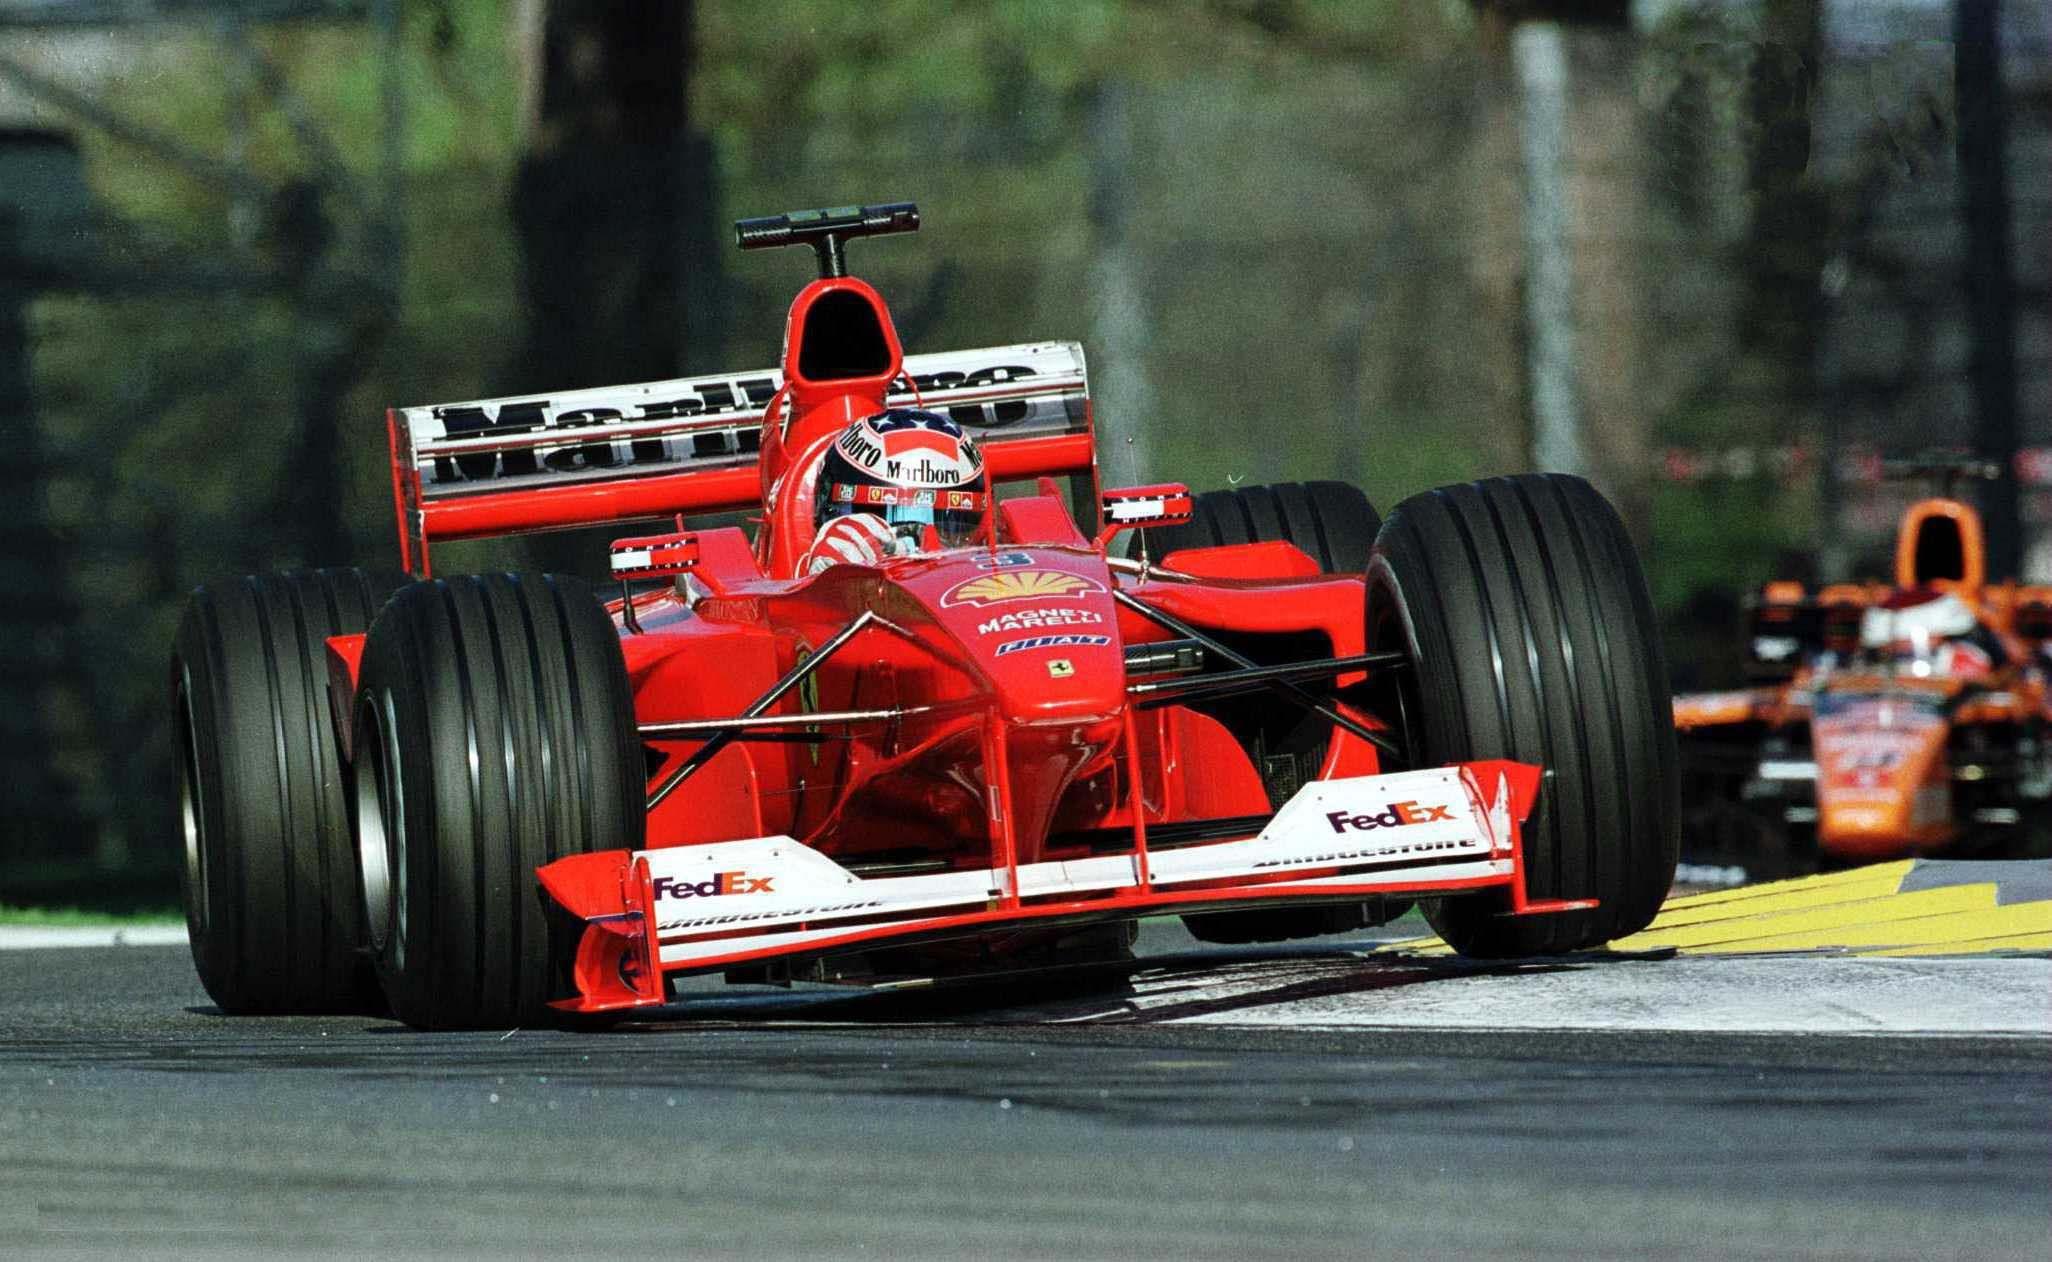 2000 Ferrari F1 2000 Michael Schumacher Ferrari Pilot Auto Da Corsa